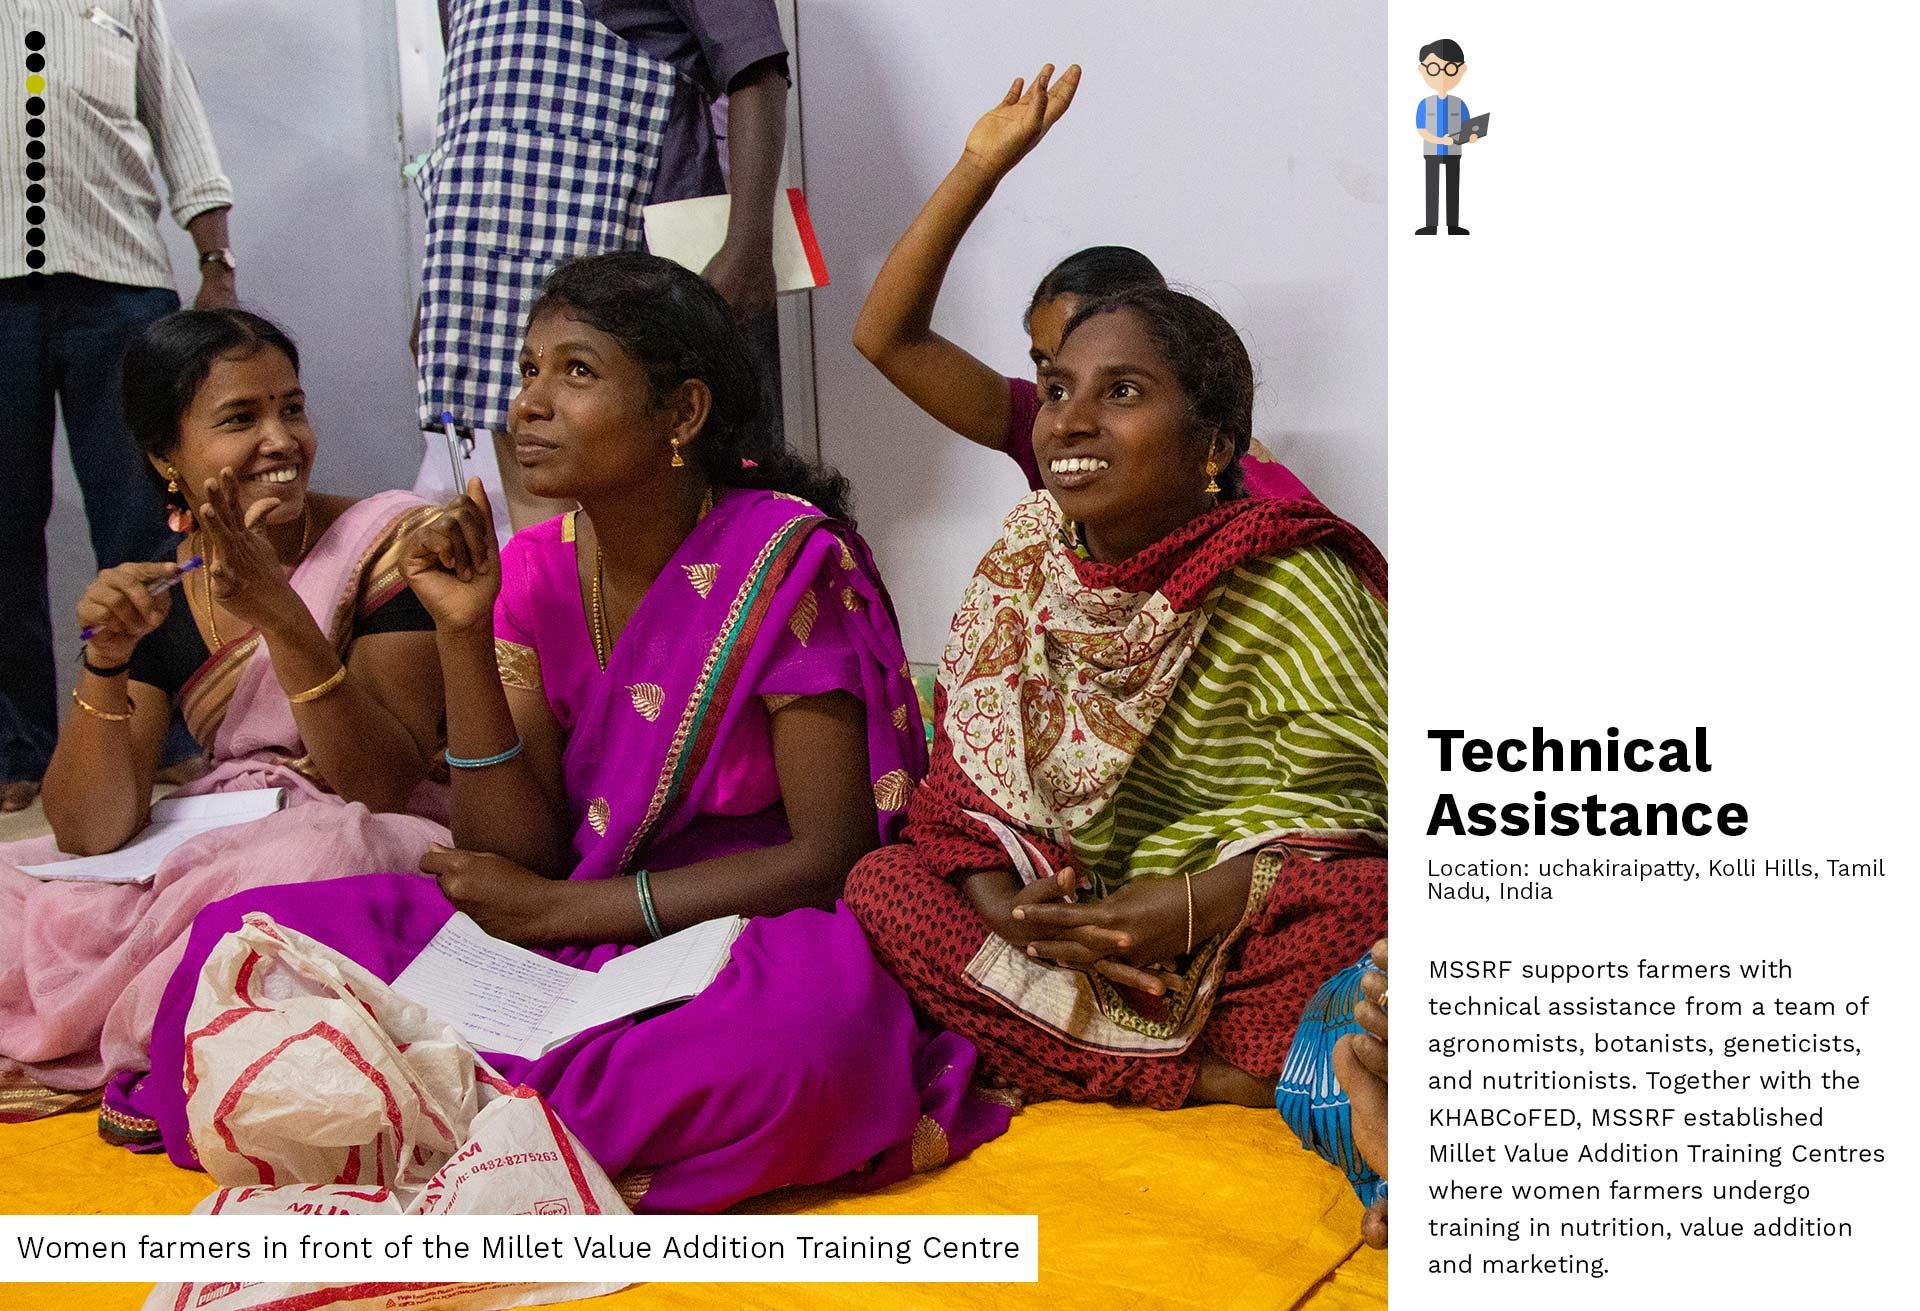 03-Technical Assistance